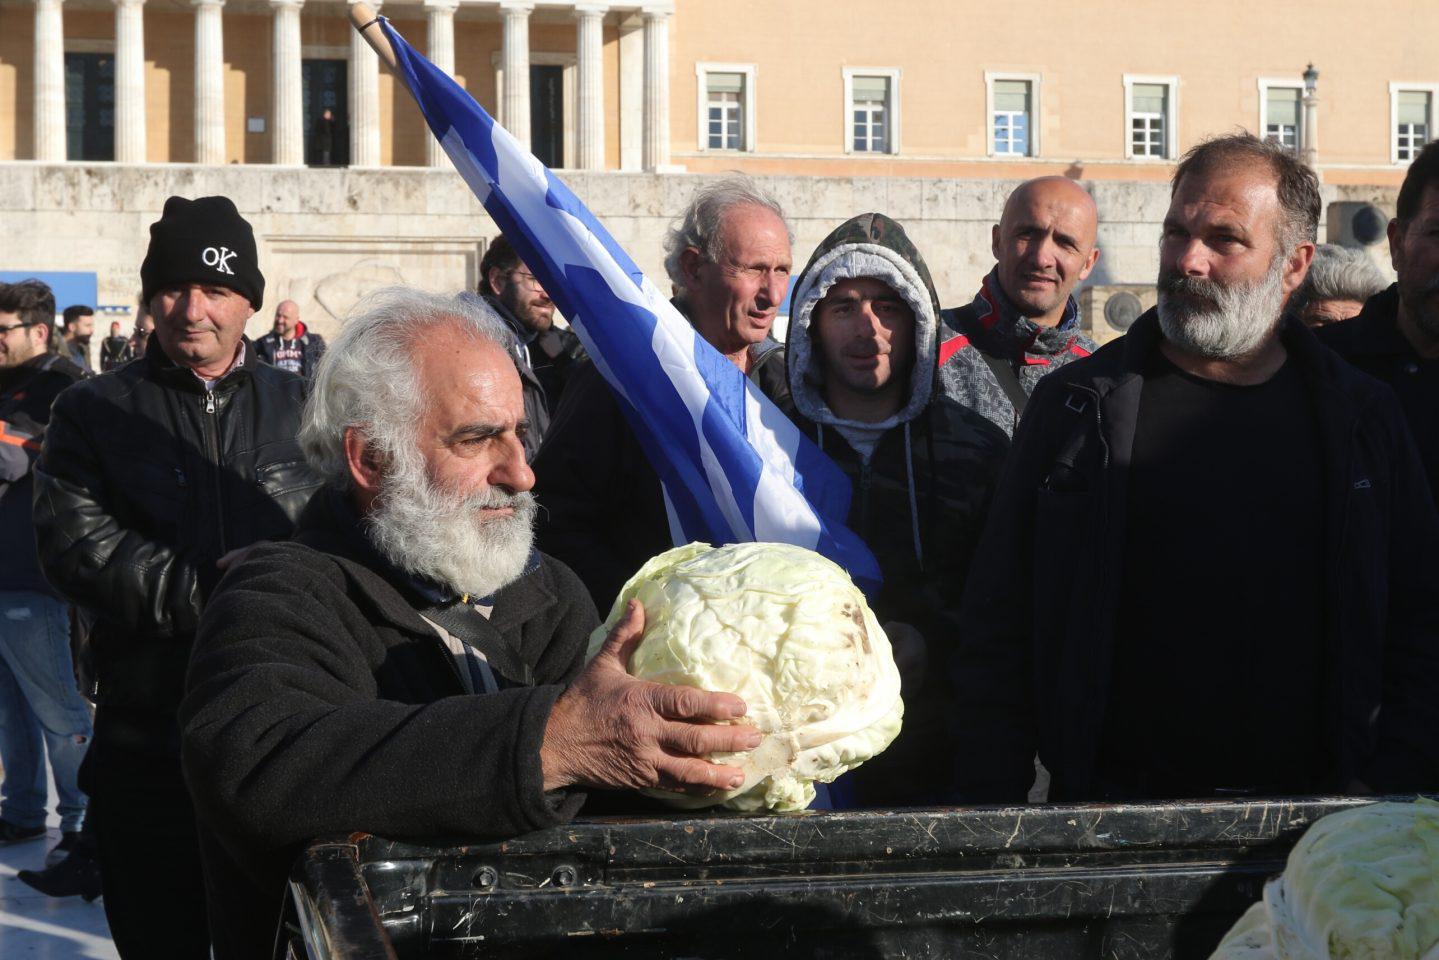 agrotes1-500 Ολοκληρώθηκε το παναγροτικό συλλαλητήριο [εικόνες]